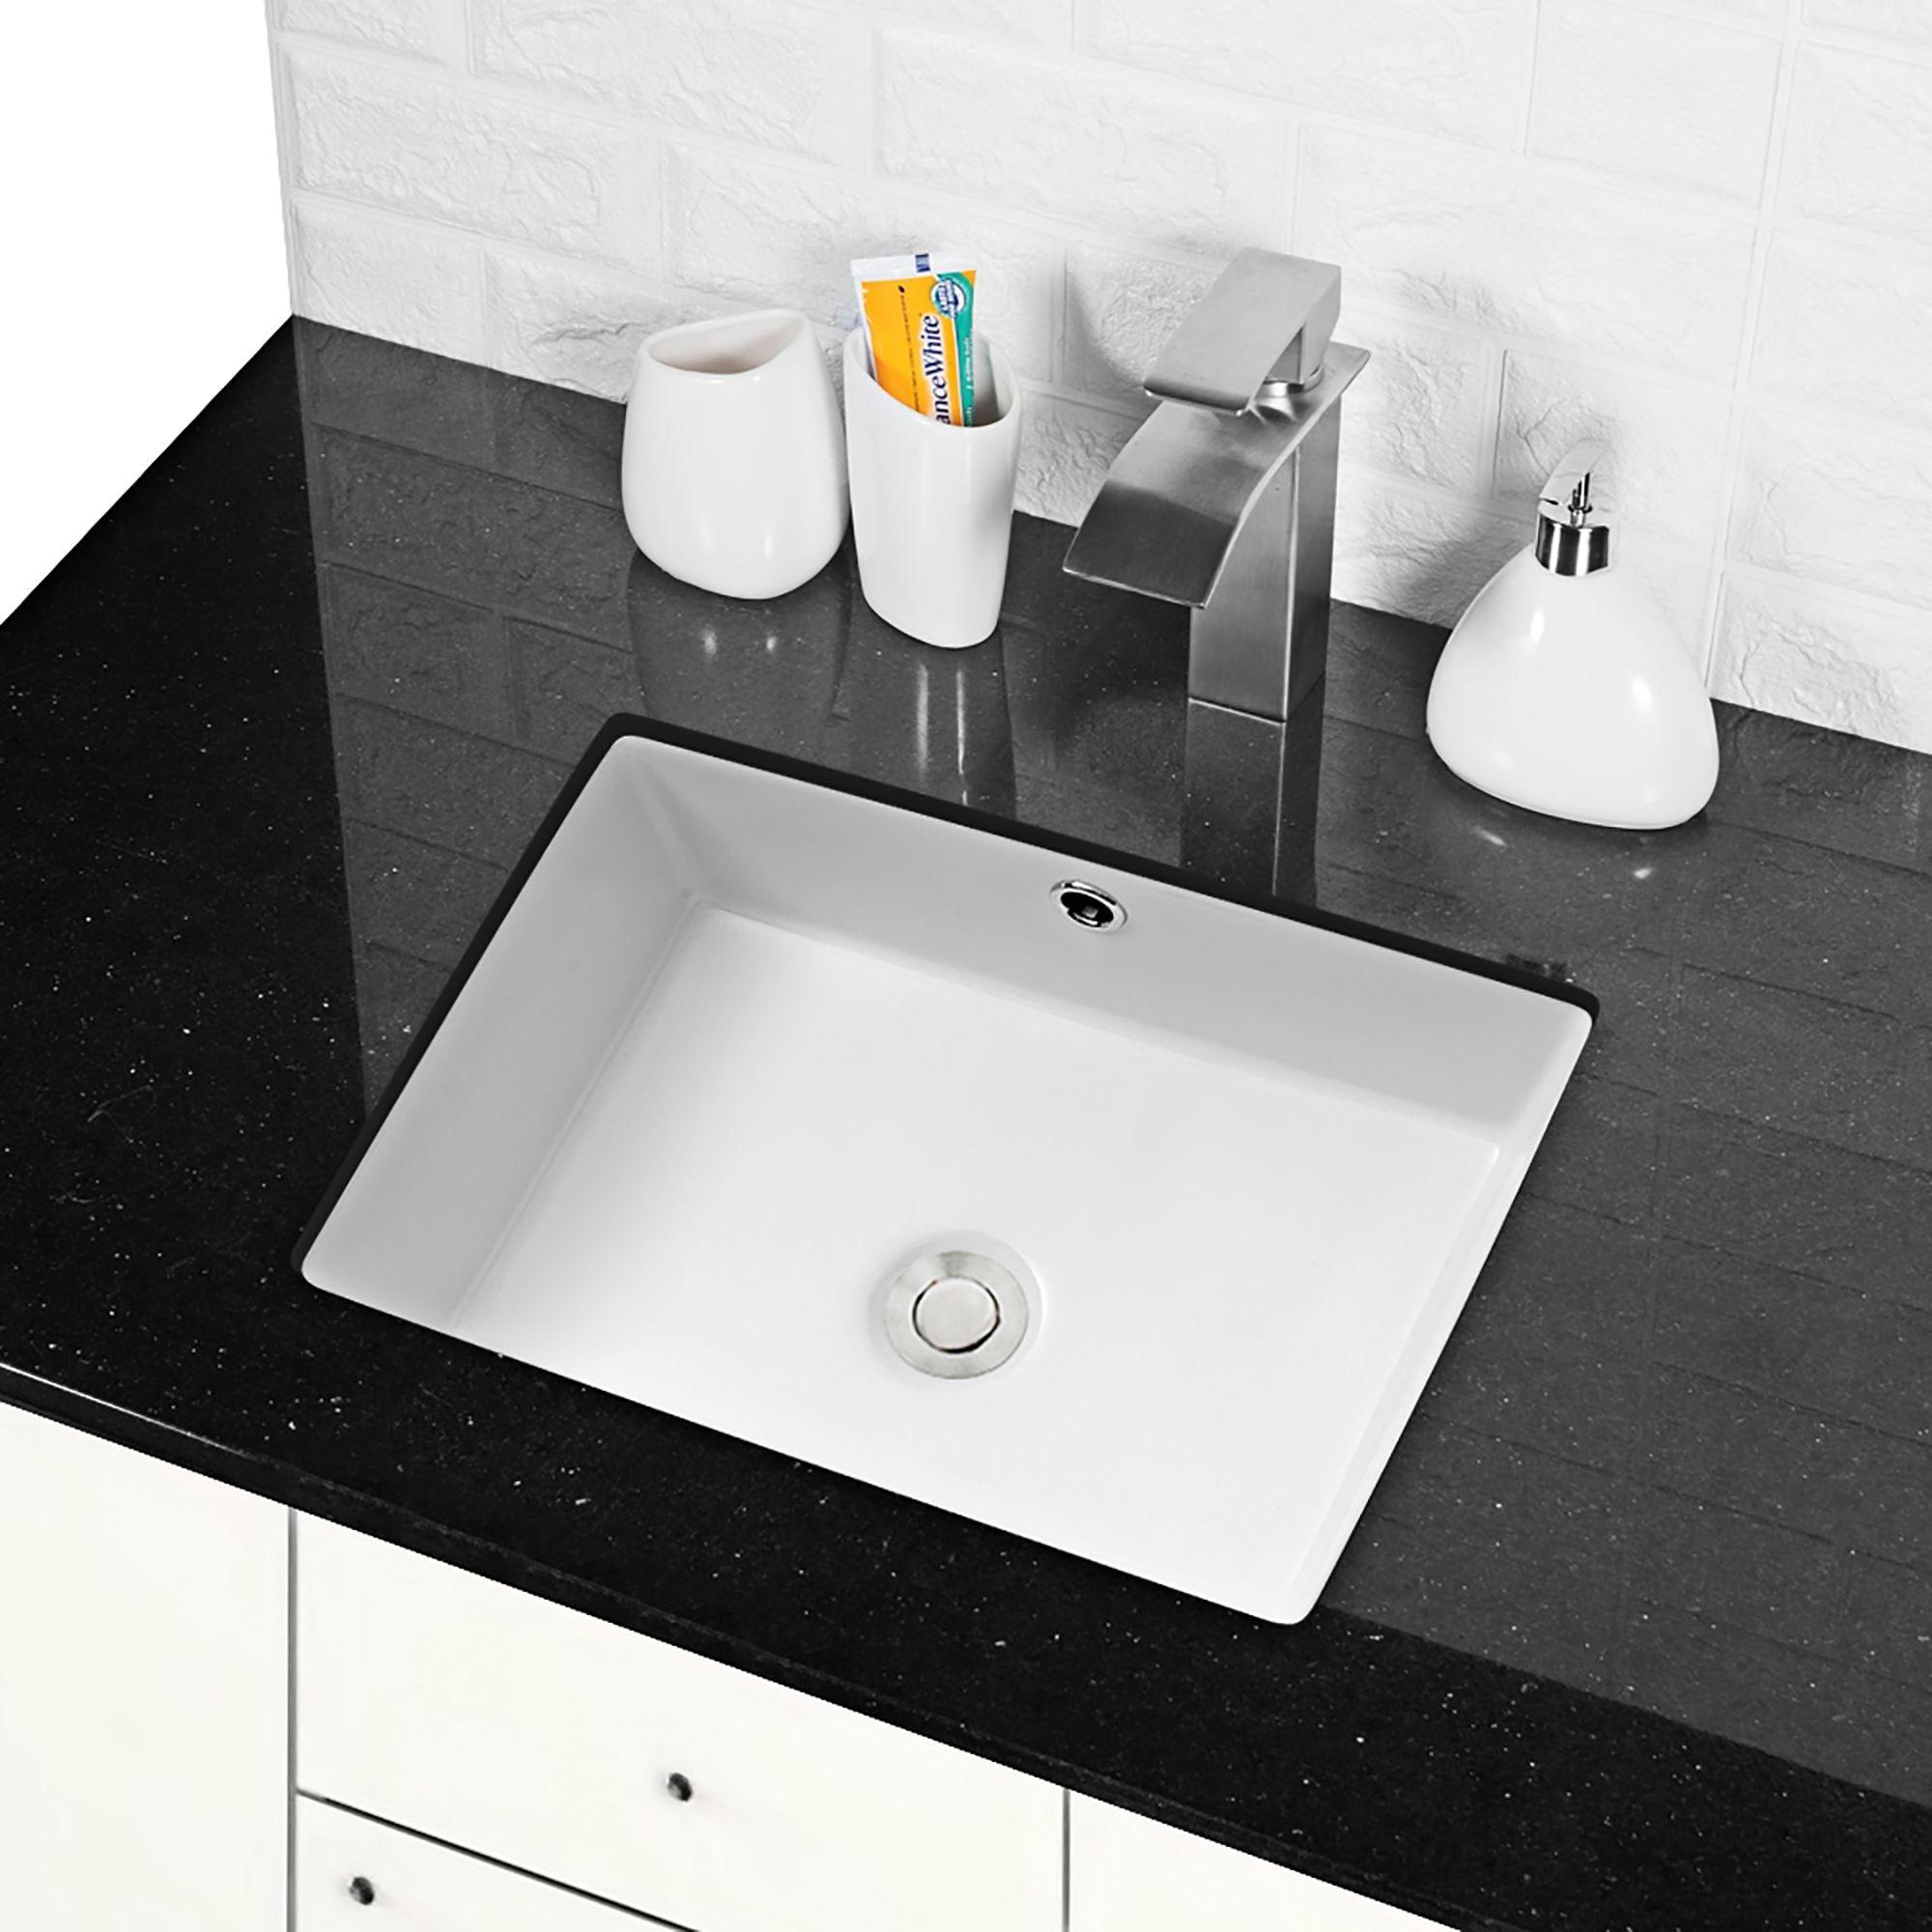 Rectangular Undermount Bathroom Sink With Overflow On Sale Overstock 31420602